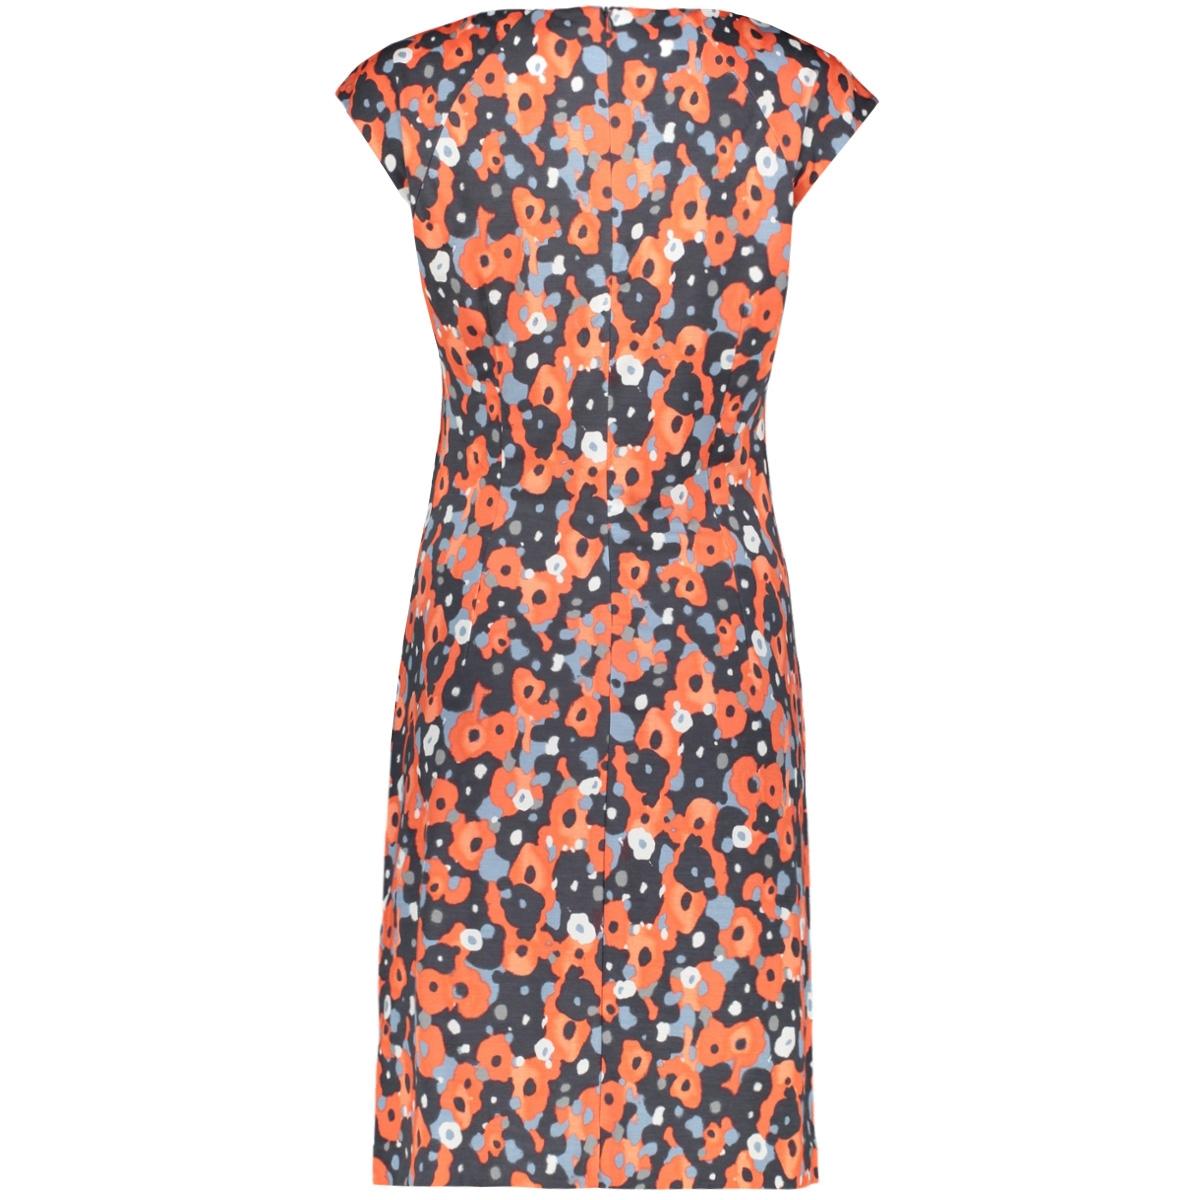 jurk met aquarel bloemenprint 23001716 sandwich jurk 20139